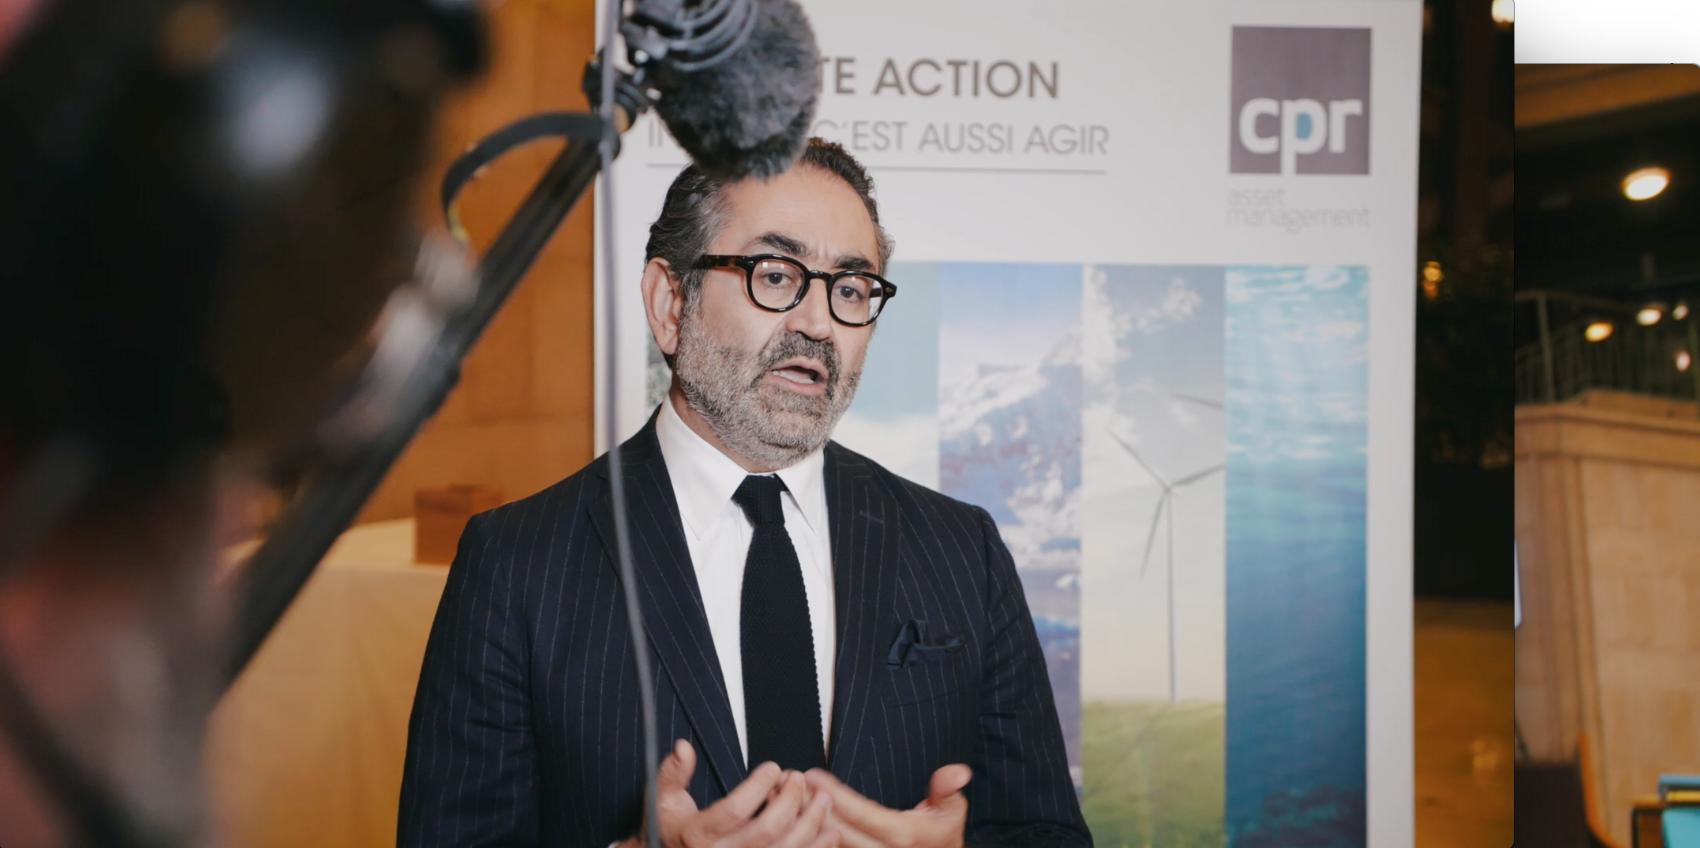 CPR AM Climate Action Vafa Ahmadi.png